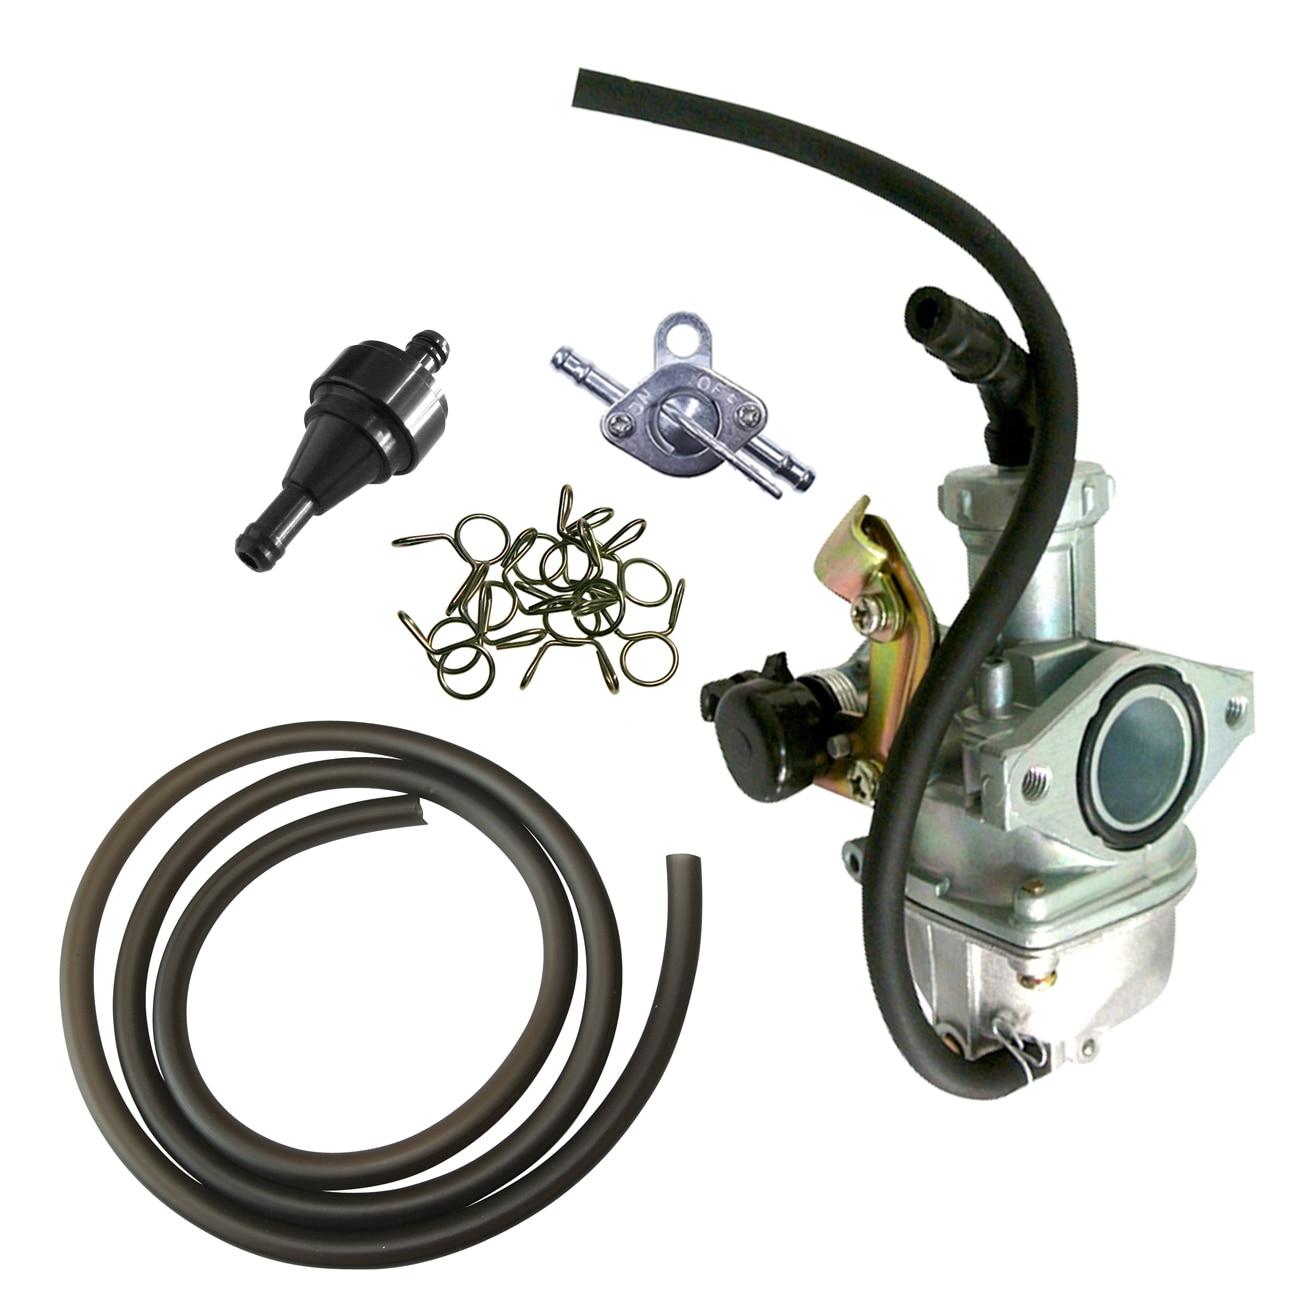 PZ 19mm Cable Choke Carburetor Black Pipe Line For 70cc 90cc 125cc Dirt Bike